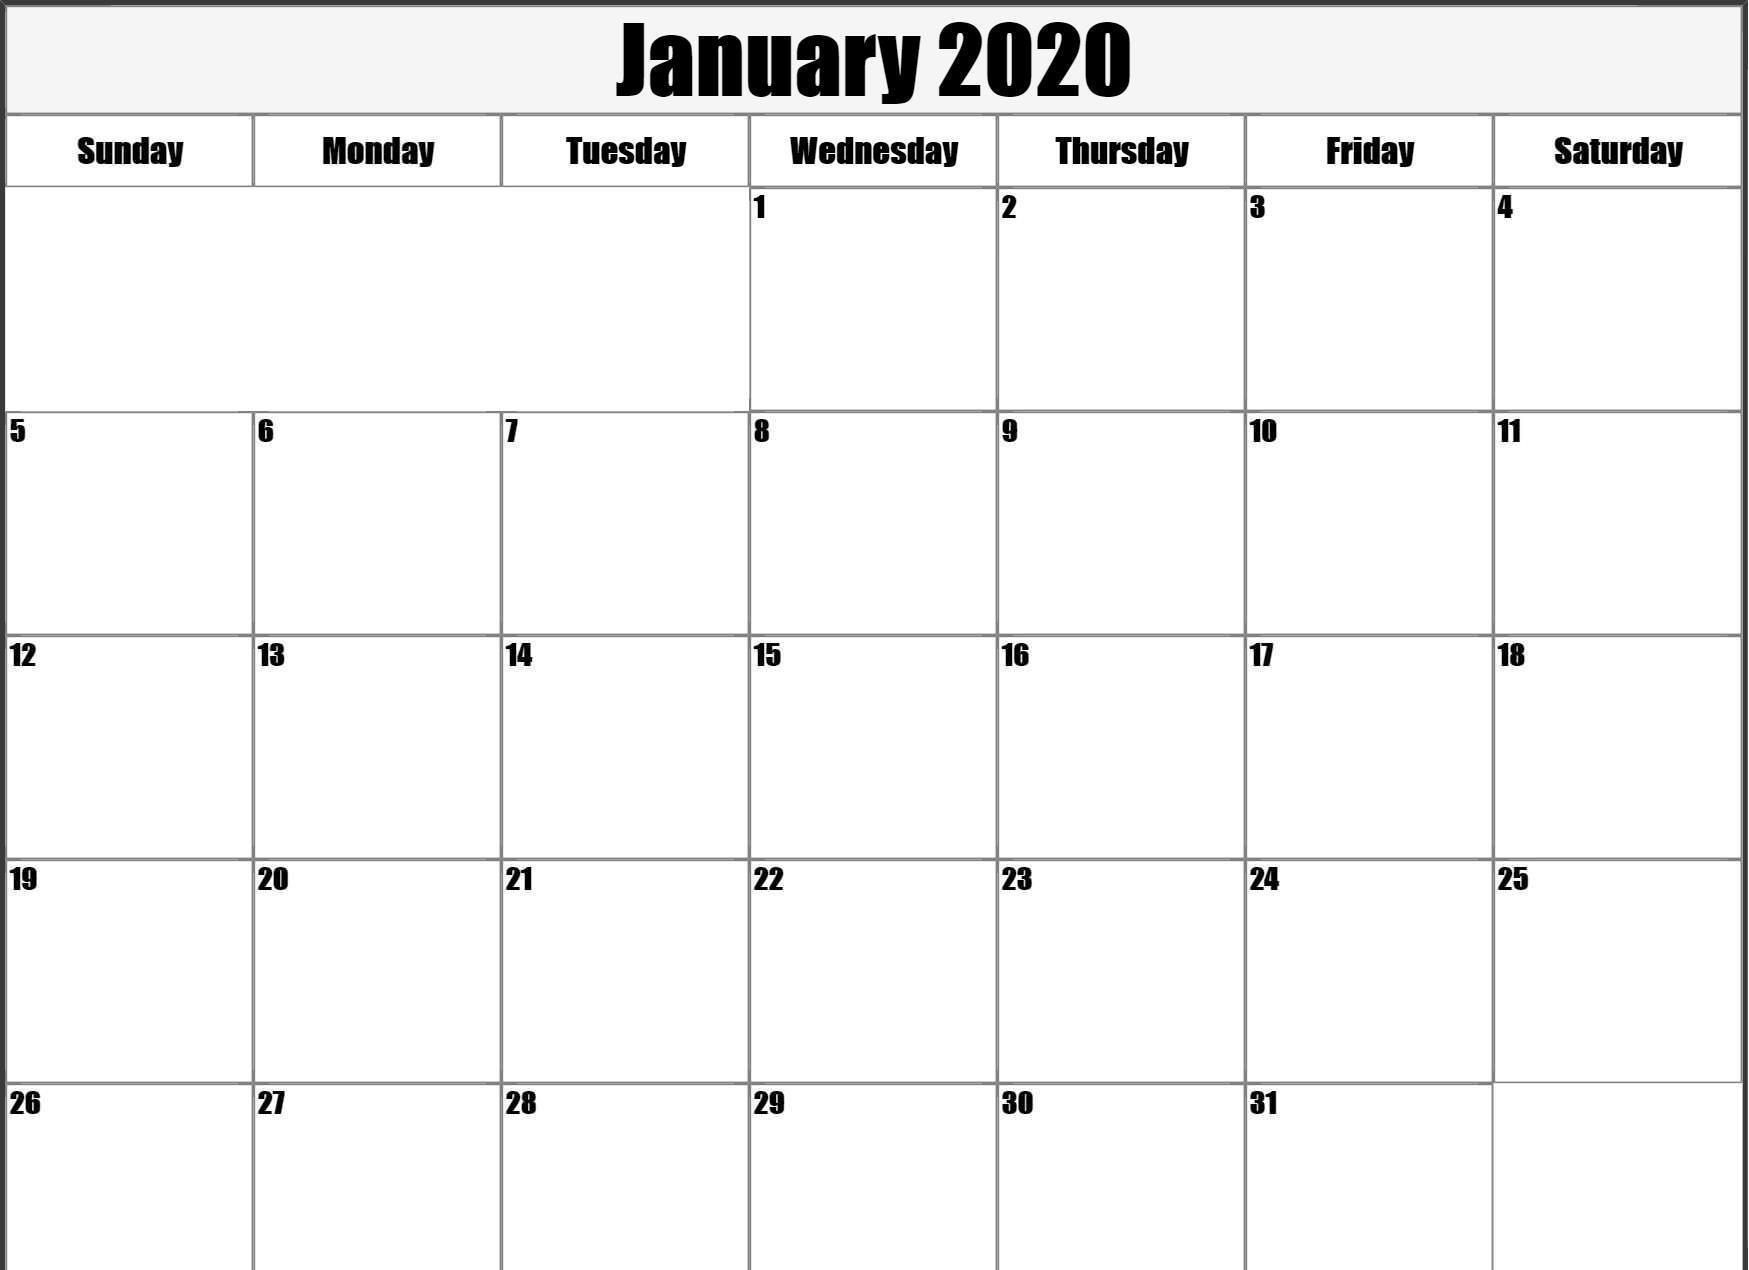 Free Clipart January 2020